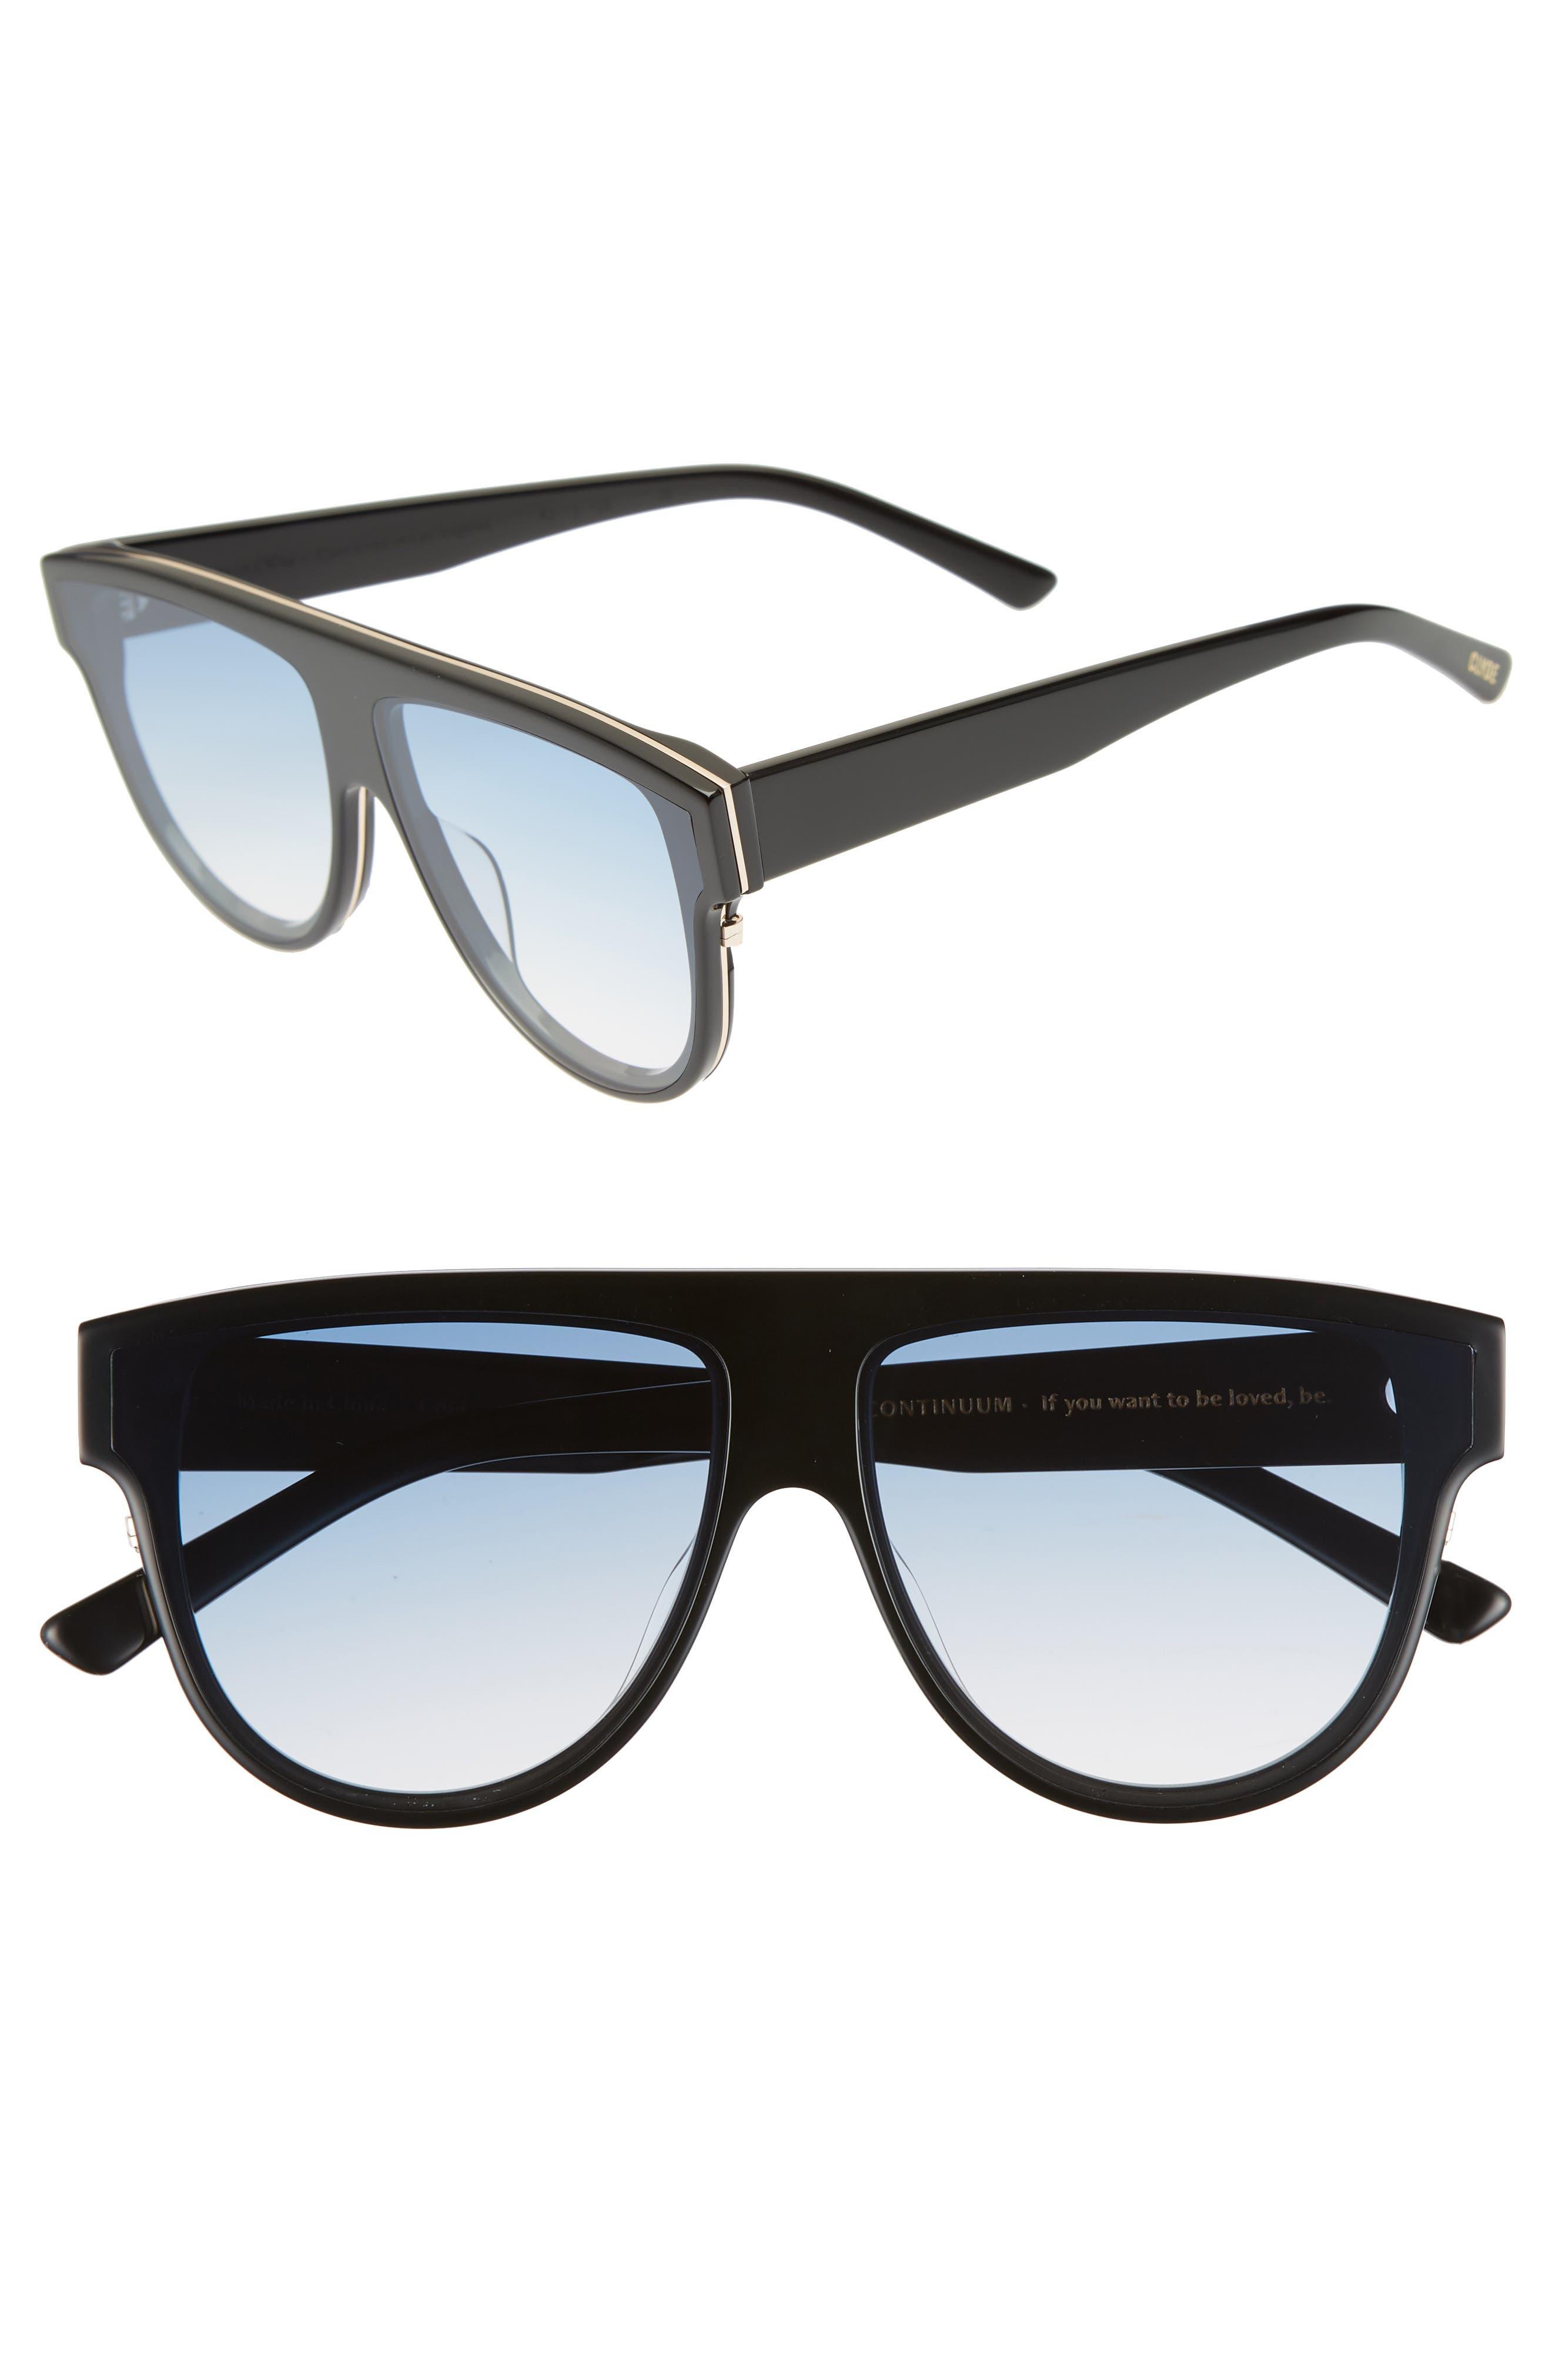 Continuum 63mm Oversize Flat Top Sunglasses,                             Main thumbnail 1, color,                             Blue Gradient